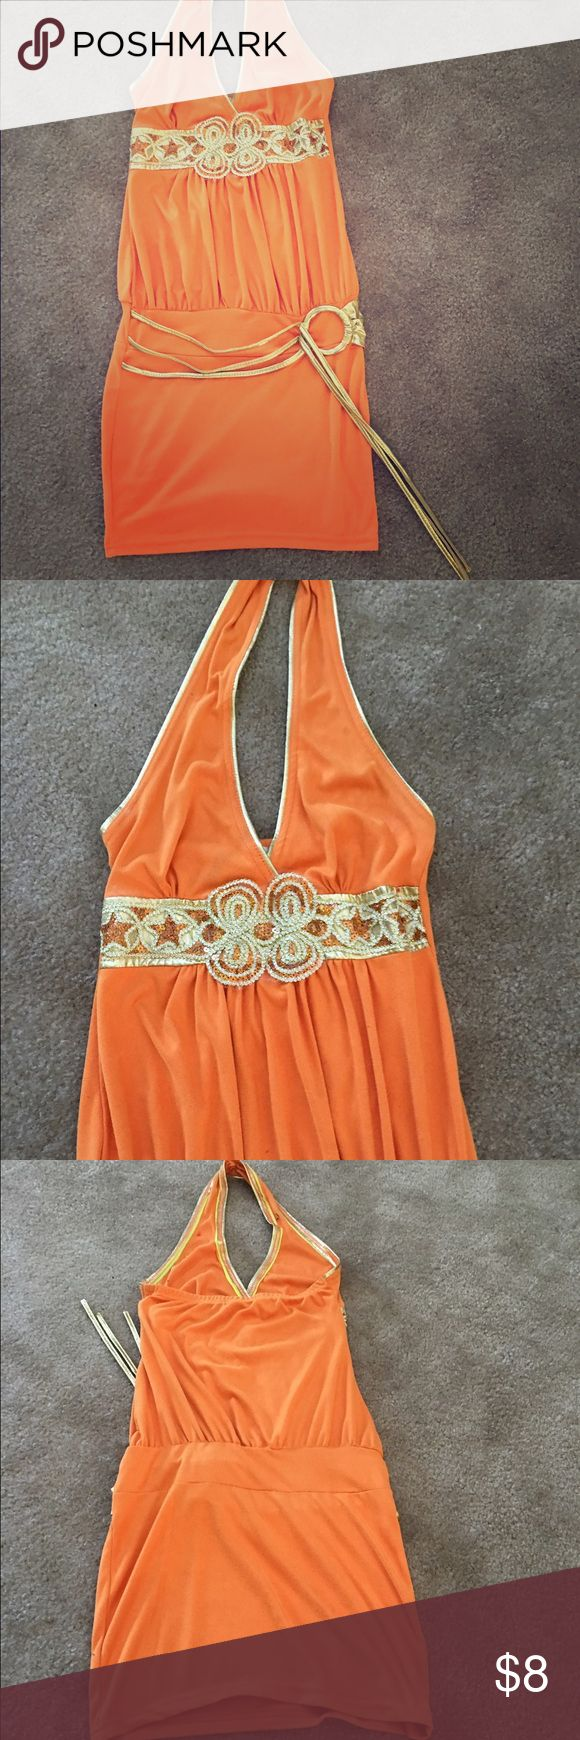 Orange suede mini dress Orange suede a mini dress with matching gold belt. cute. Comes with bonus gift. Dresses Mini